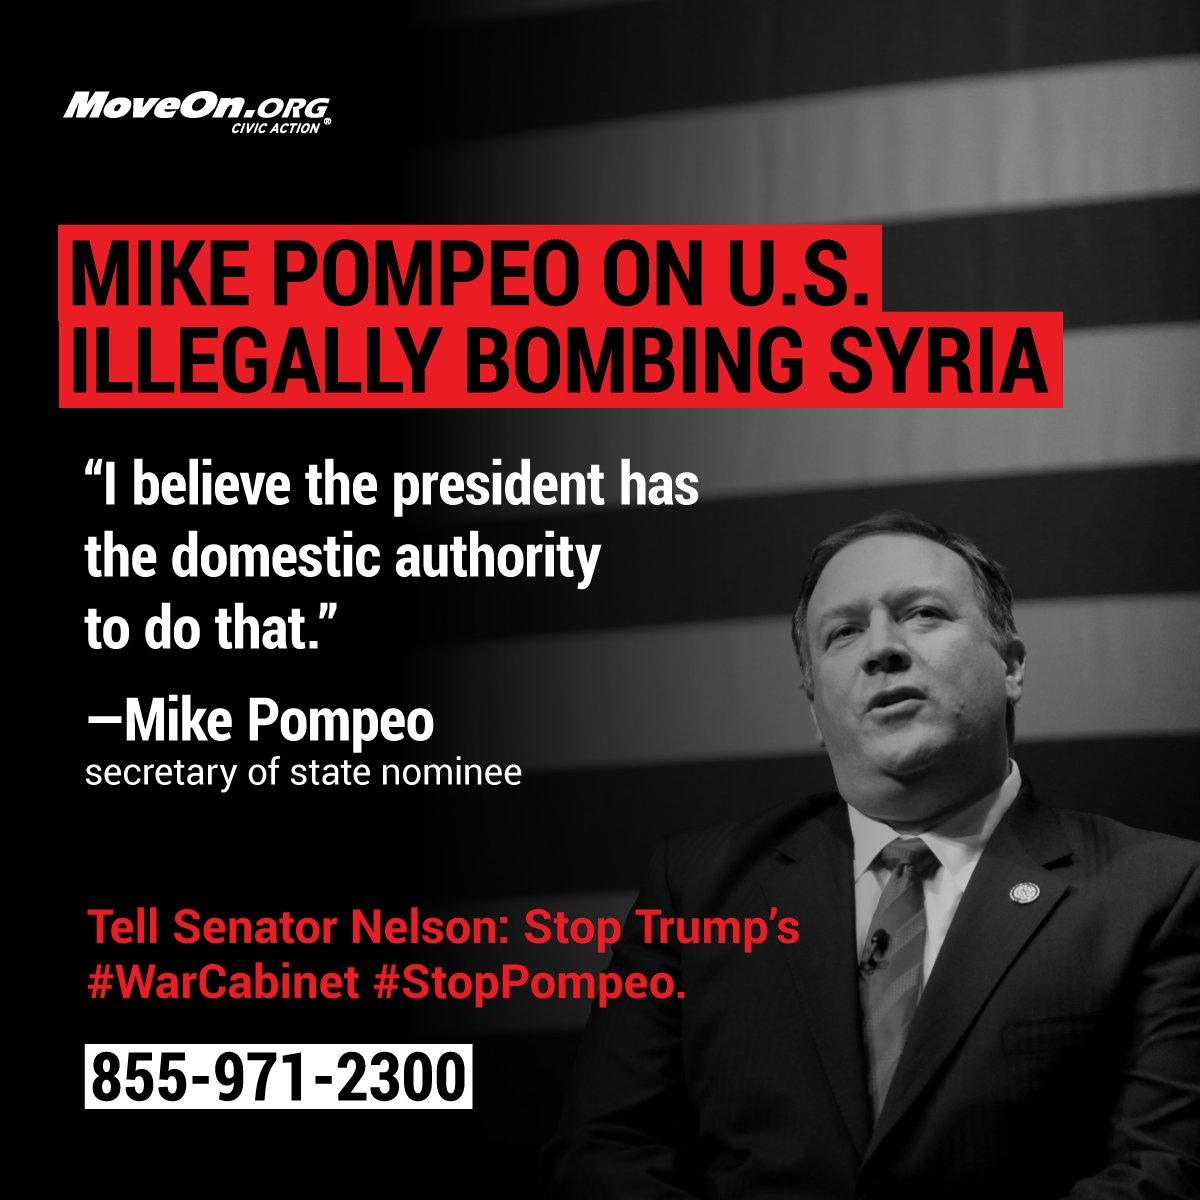 We need @SenBillNelson to stand w/ @RonWyden, @SenGillibrand, @PattyMurray, @timkaine... & block 's w@realDonaldTrumpar-loving  nom#SecOfStateinee. Demand  !@SenateDems#StopPompeo